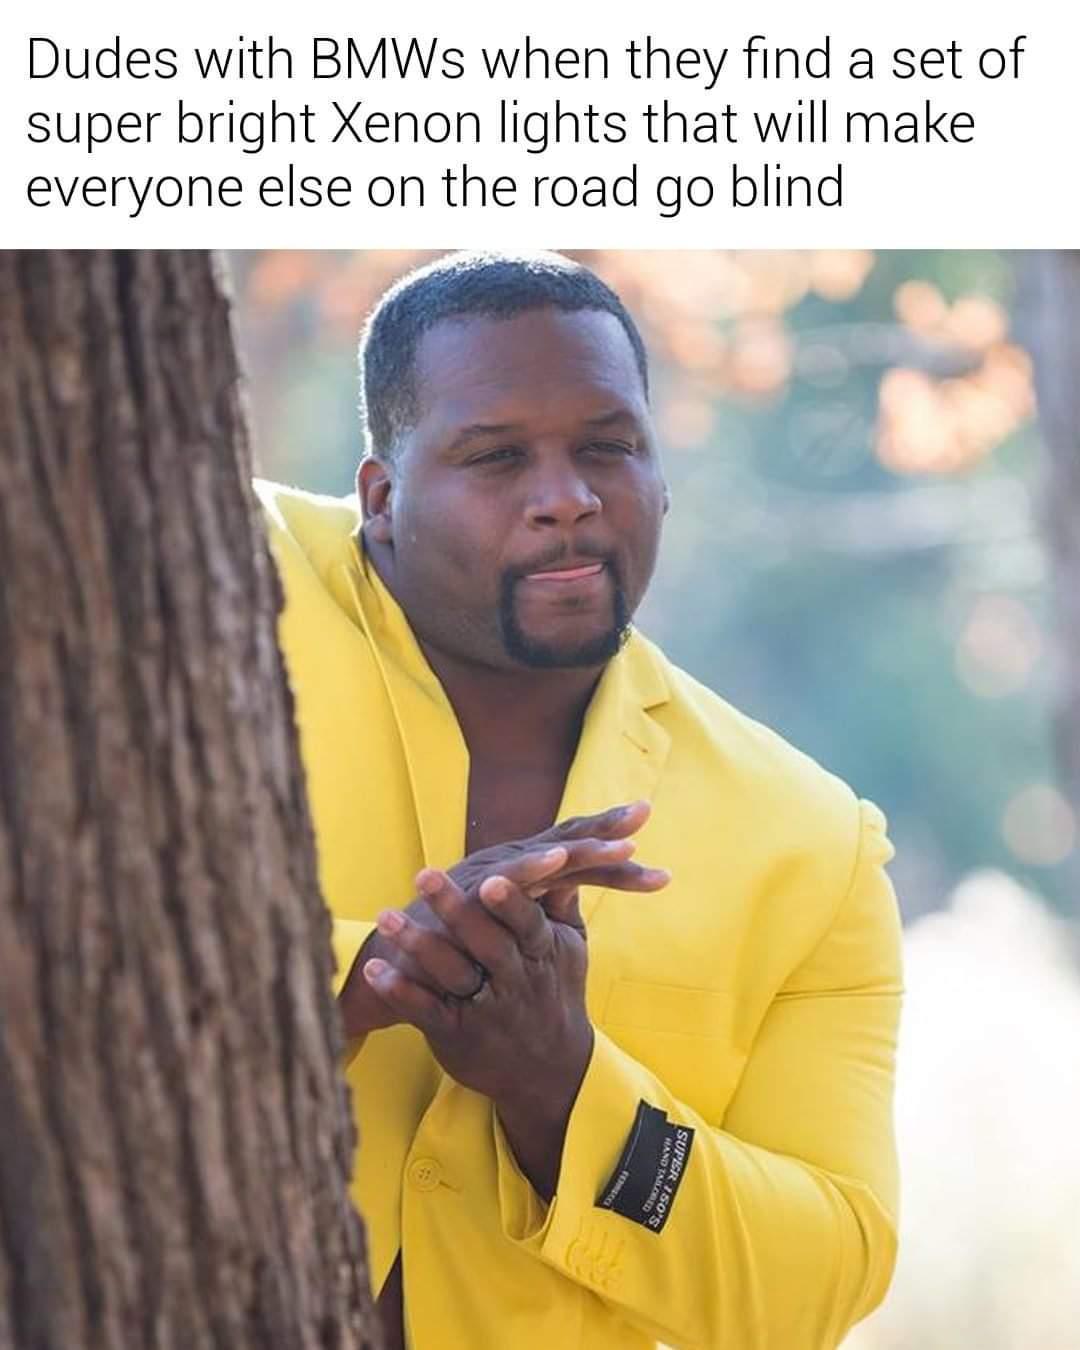 Rip eye sockets - meme